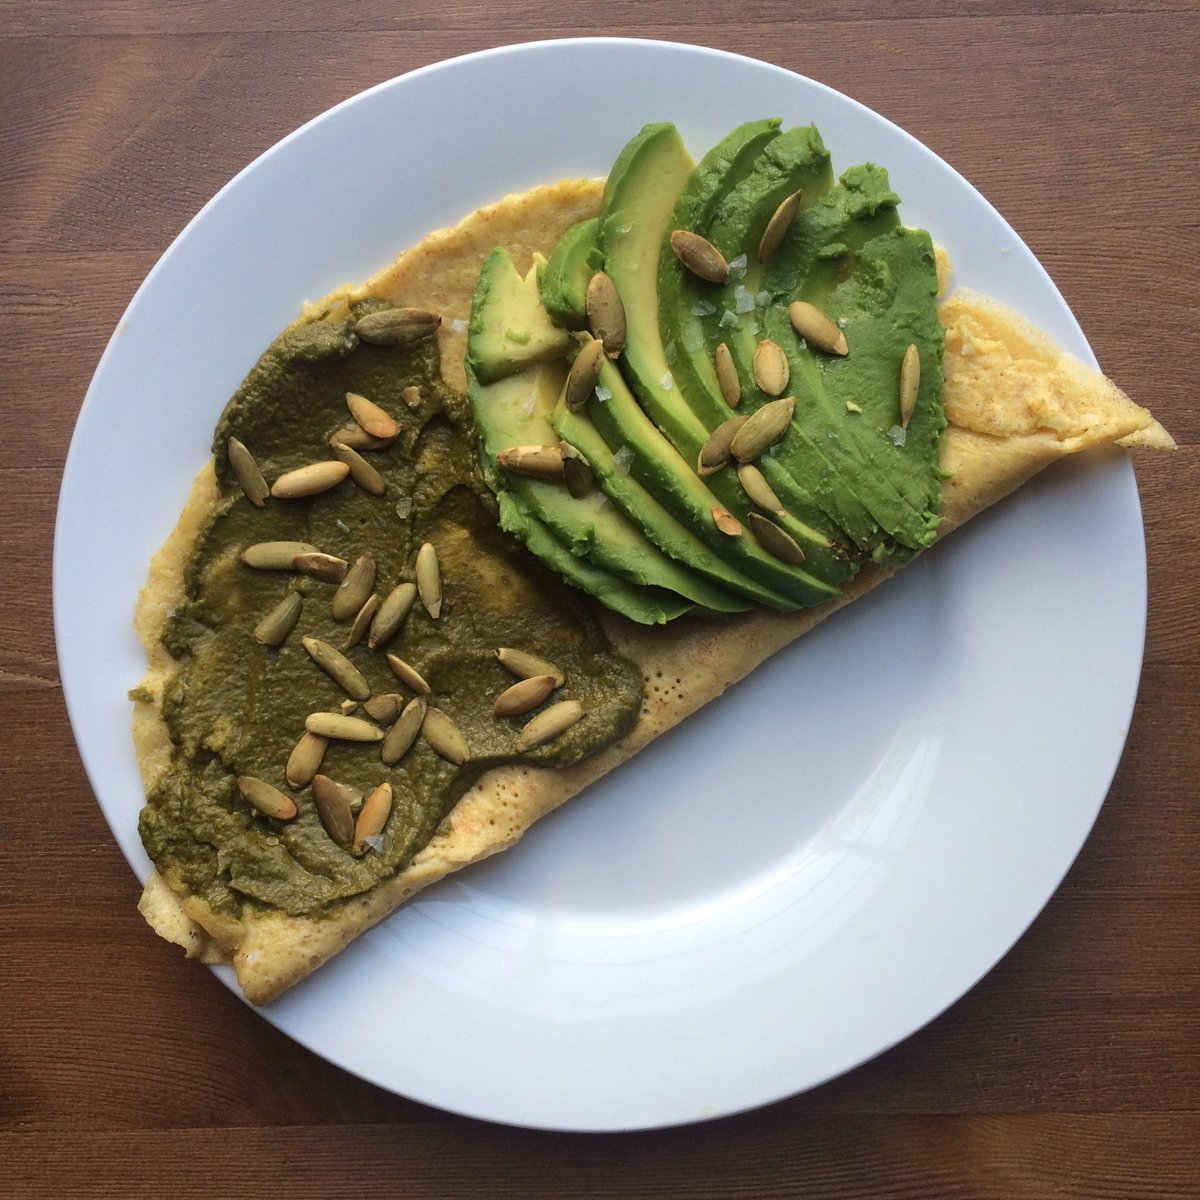 Savory #crepe. #Sourdough starter #leaven, #eggs, #avocado, #kale-#basil #pesto, #pepitas, #Maldon #salt. #food #fermented #OchoEatTweets<br>http://pic.twitter.com/I8eoxp2B8d